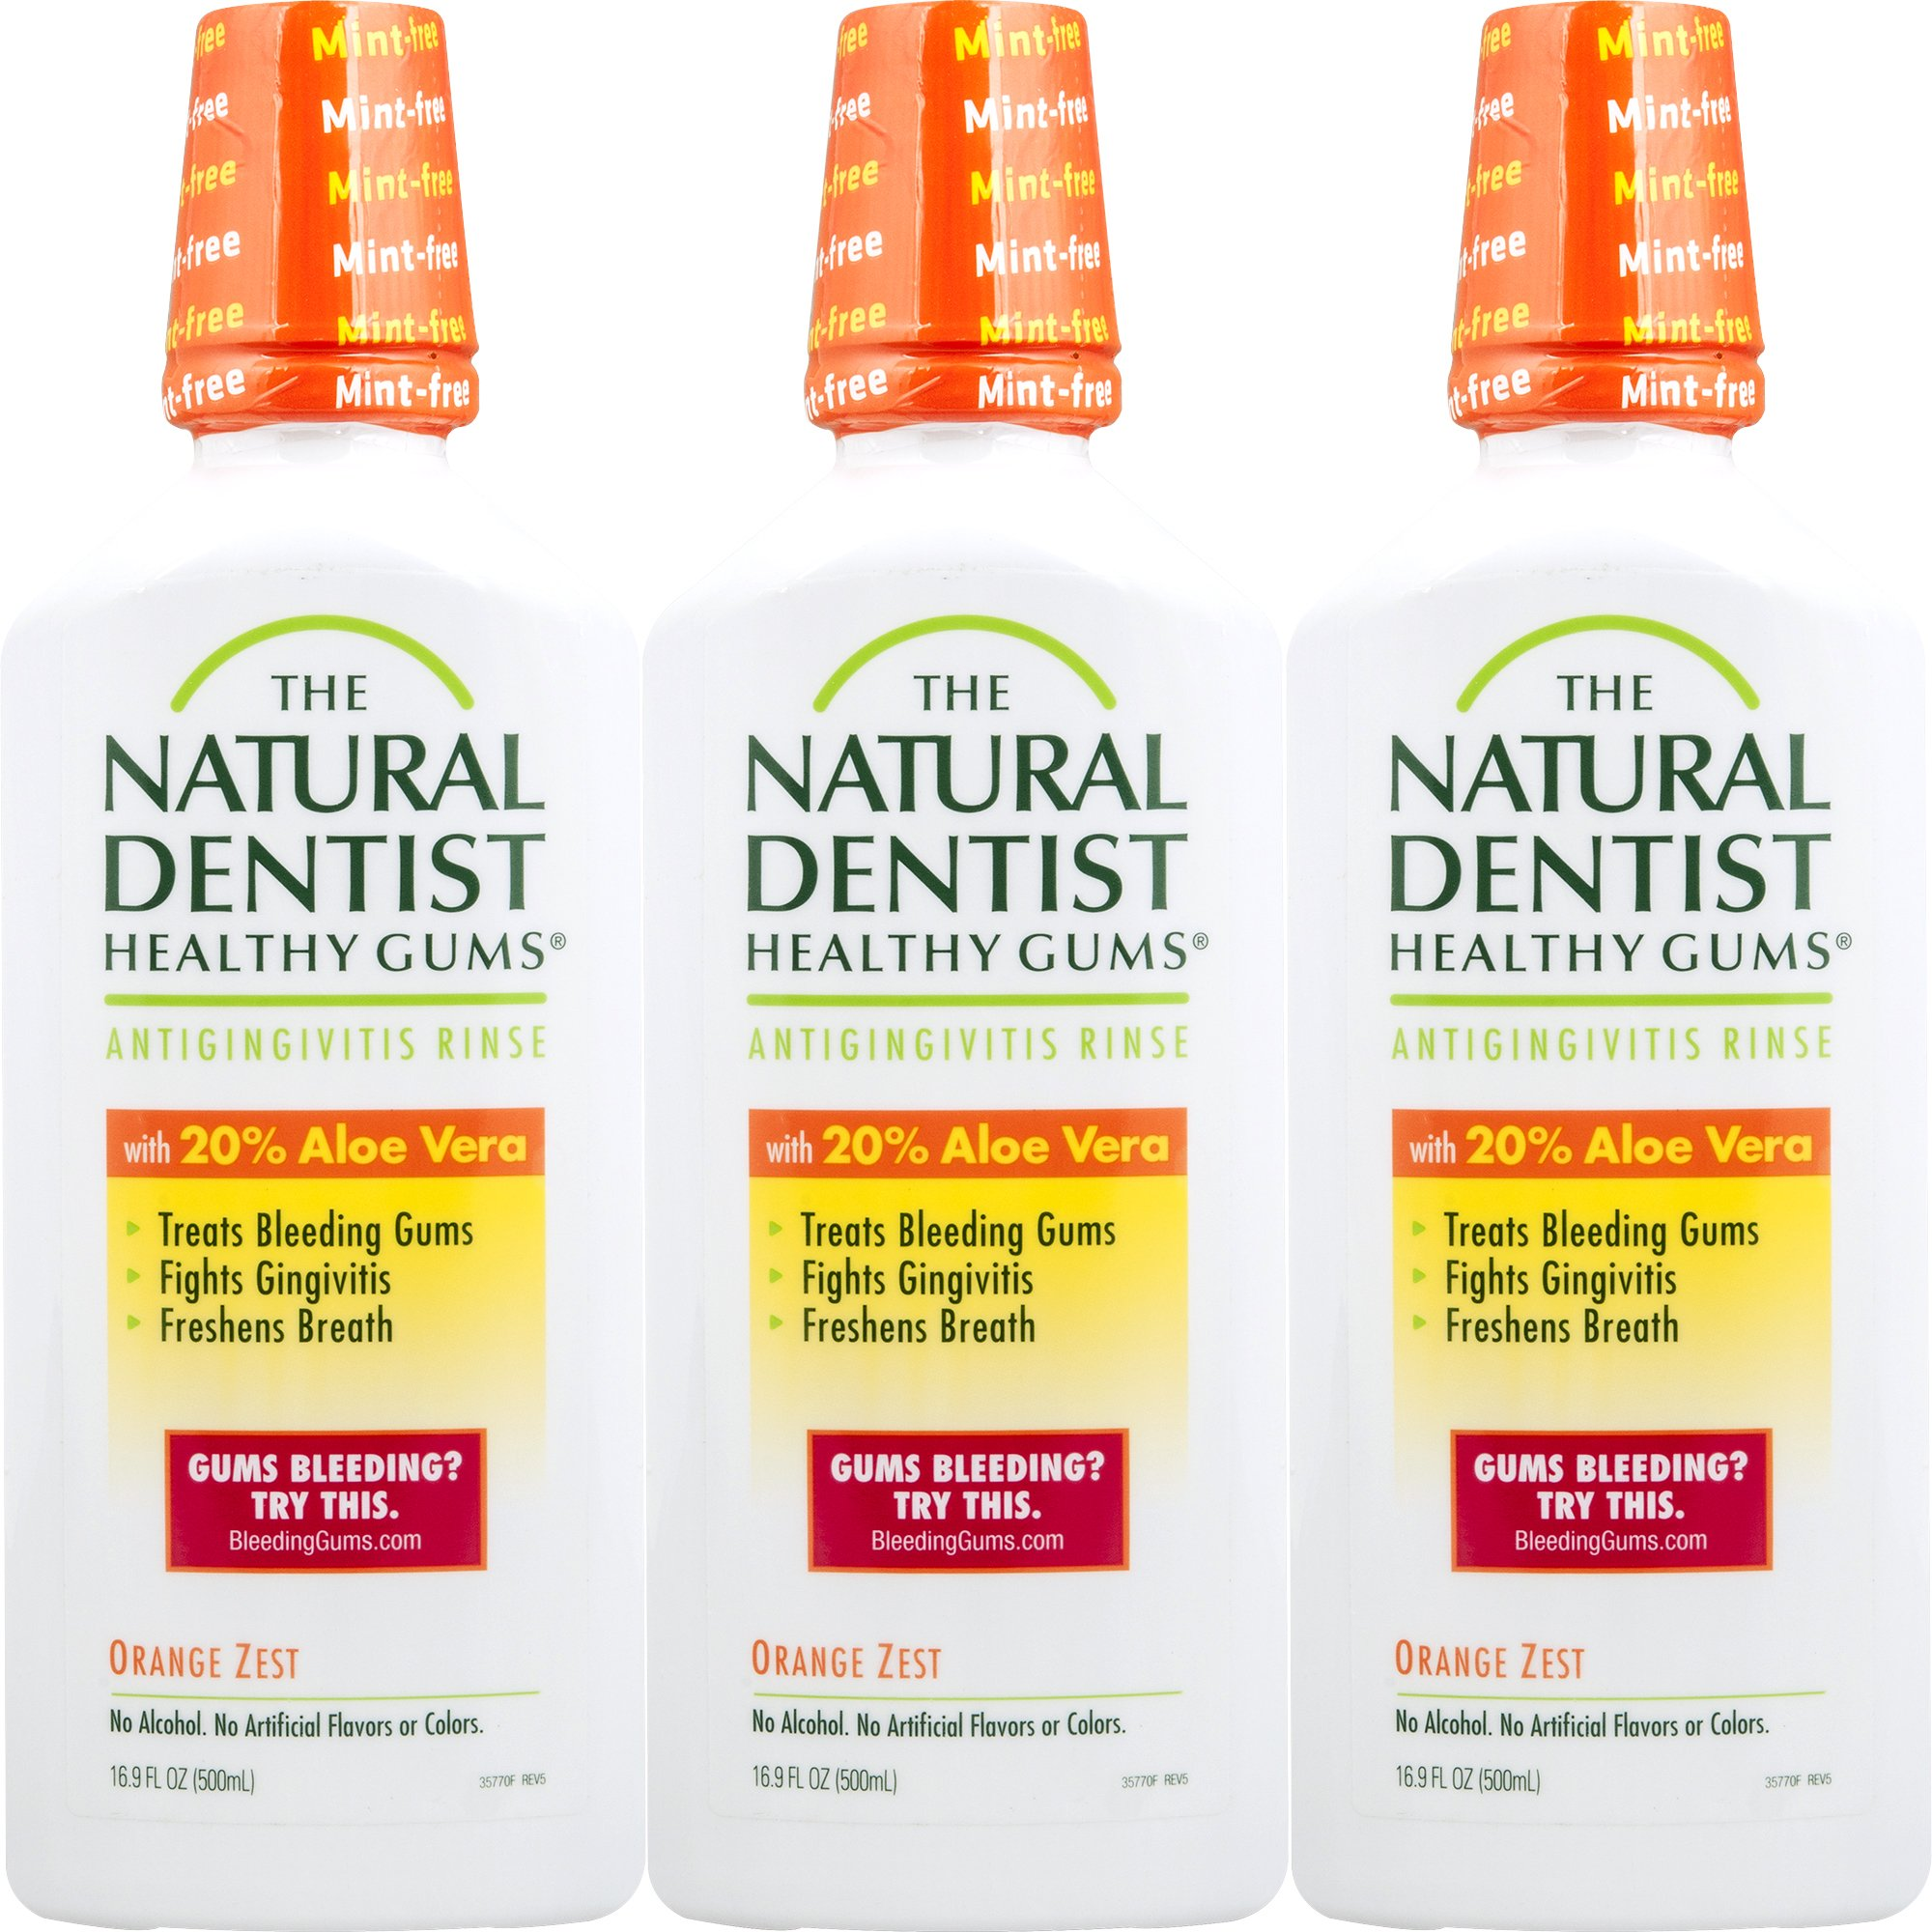 The Natural Dentist Healthy Gums Antigingivitis Mouthwash, Orange Zest, 16.9 Ounce Bottle (Pack of 3), Alcohol-Free Mouthwash for Daily Use, Treats Bleeding Gums and Fights Gingivitis, 20% Aloe Vera